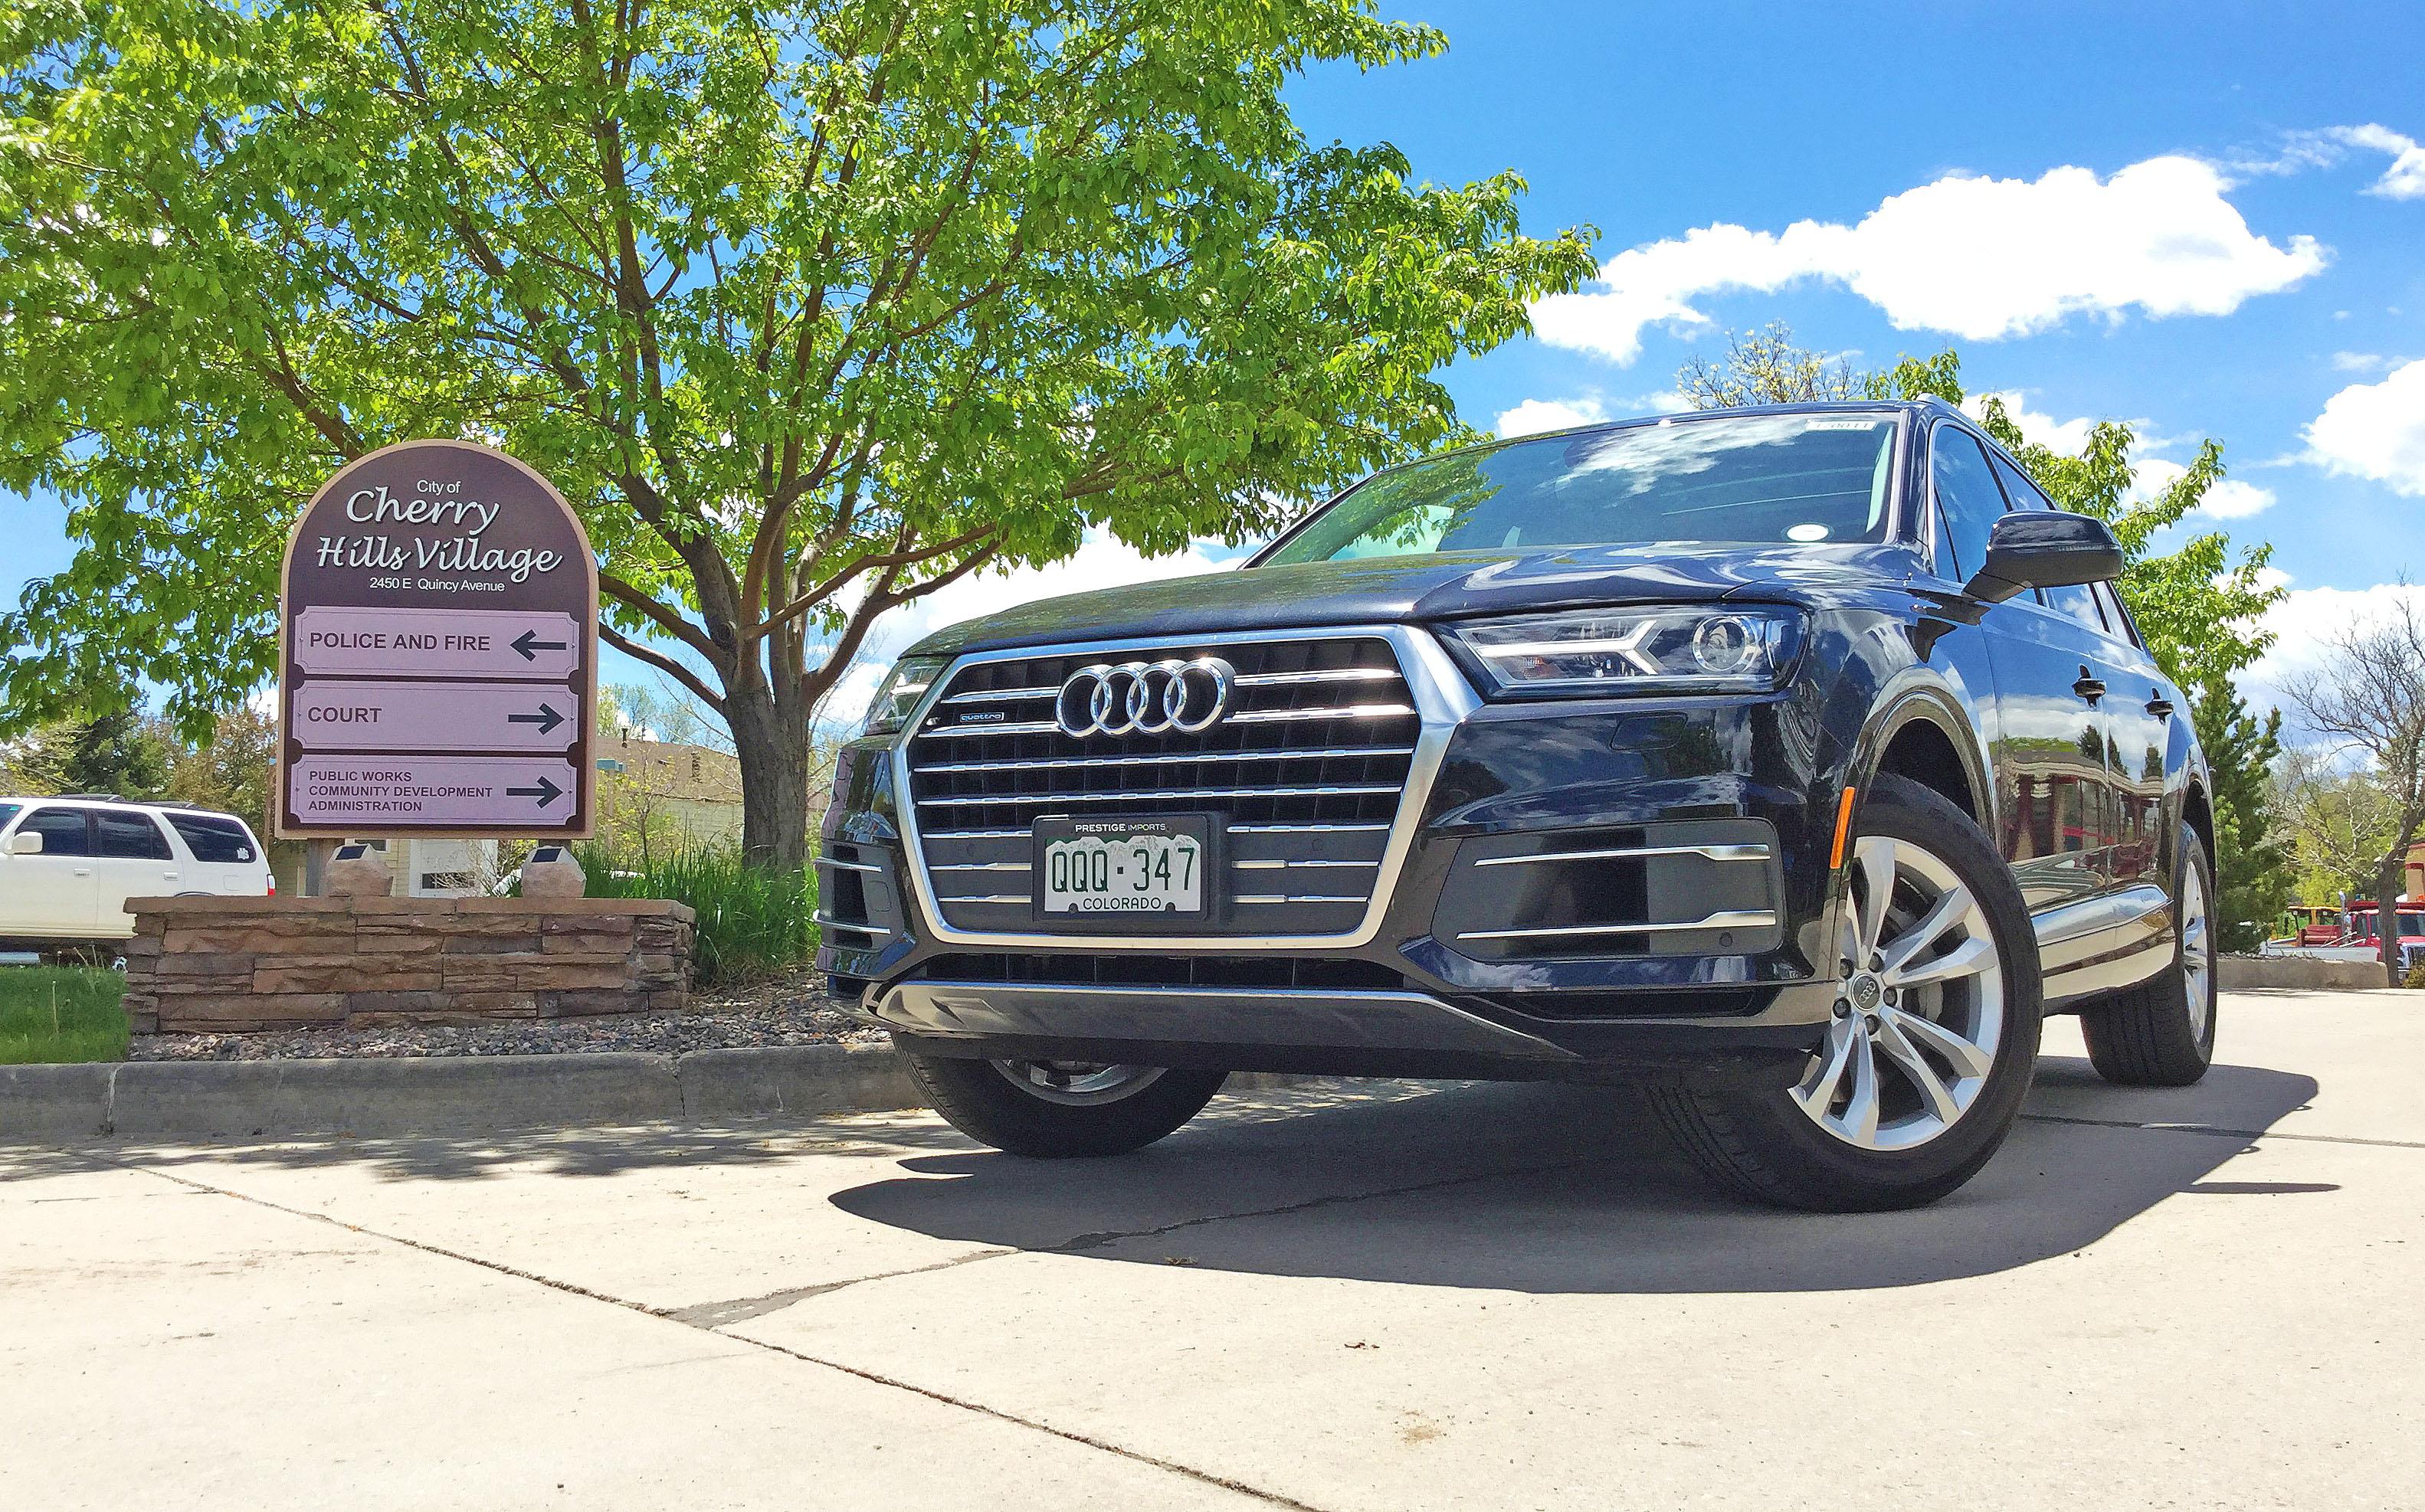 Audi Cherry Hill >> Cherry Hills Village Colorado And The Audi Q7